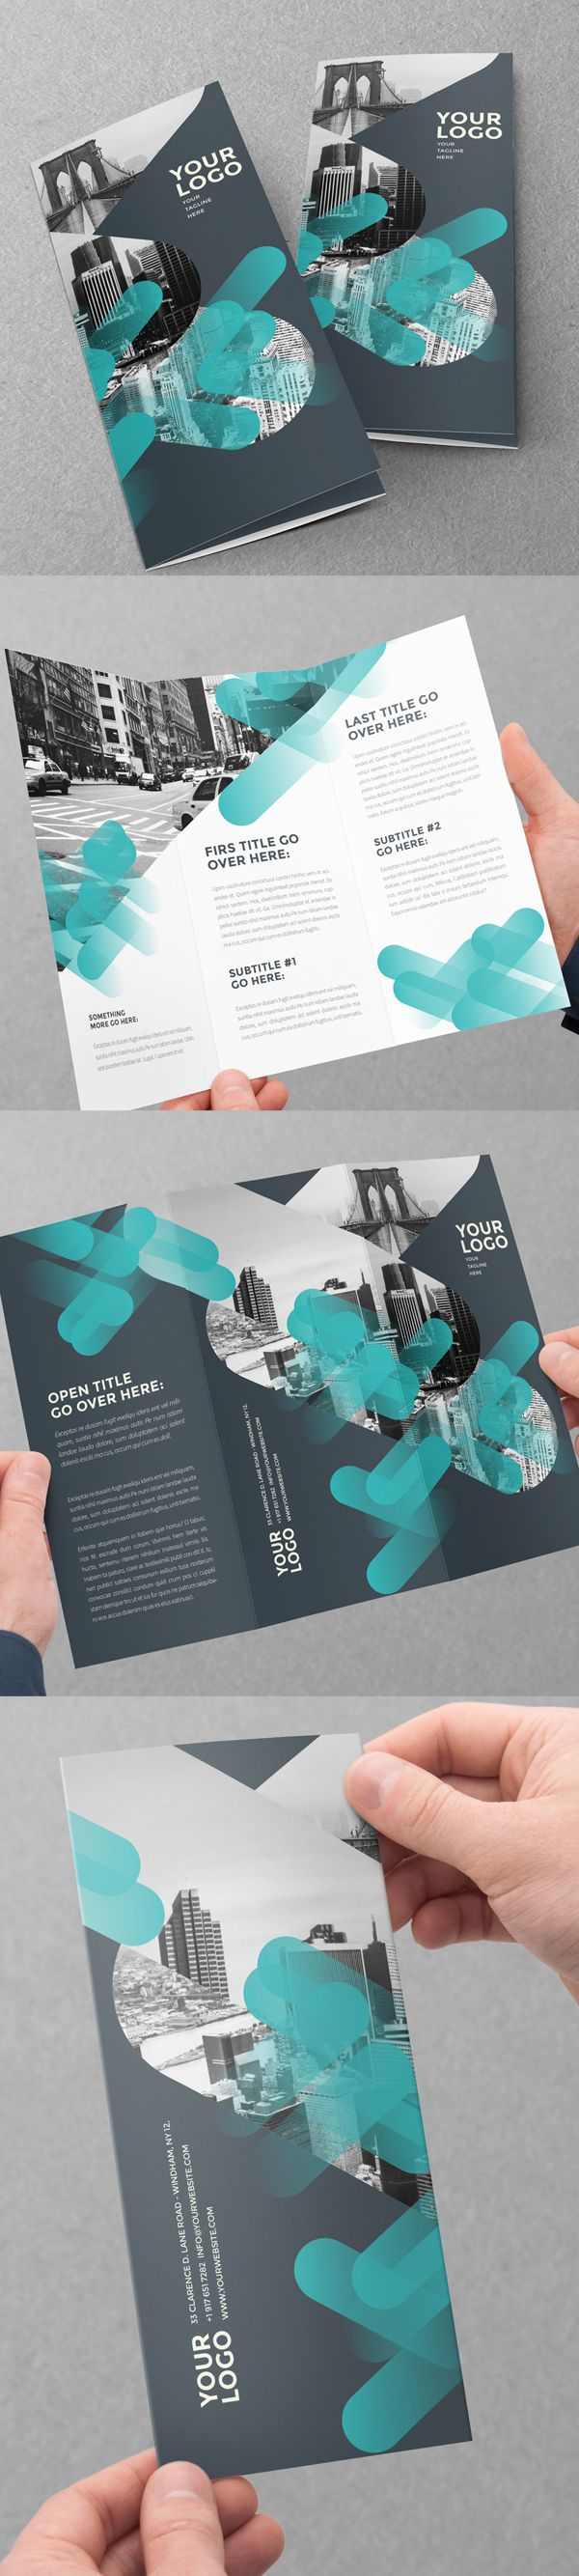 Modern Creative TriFold Brochure Design Booklet Brochuredesign